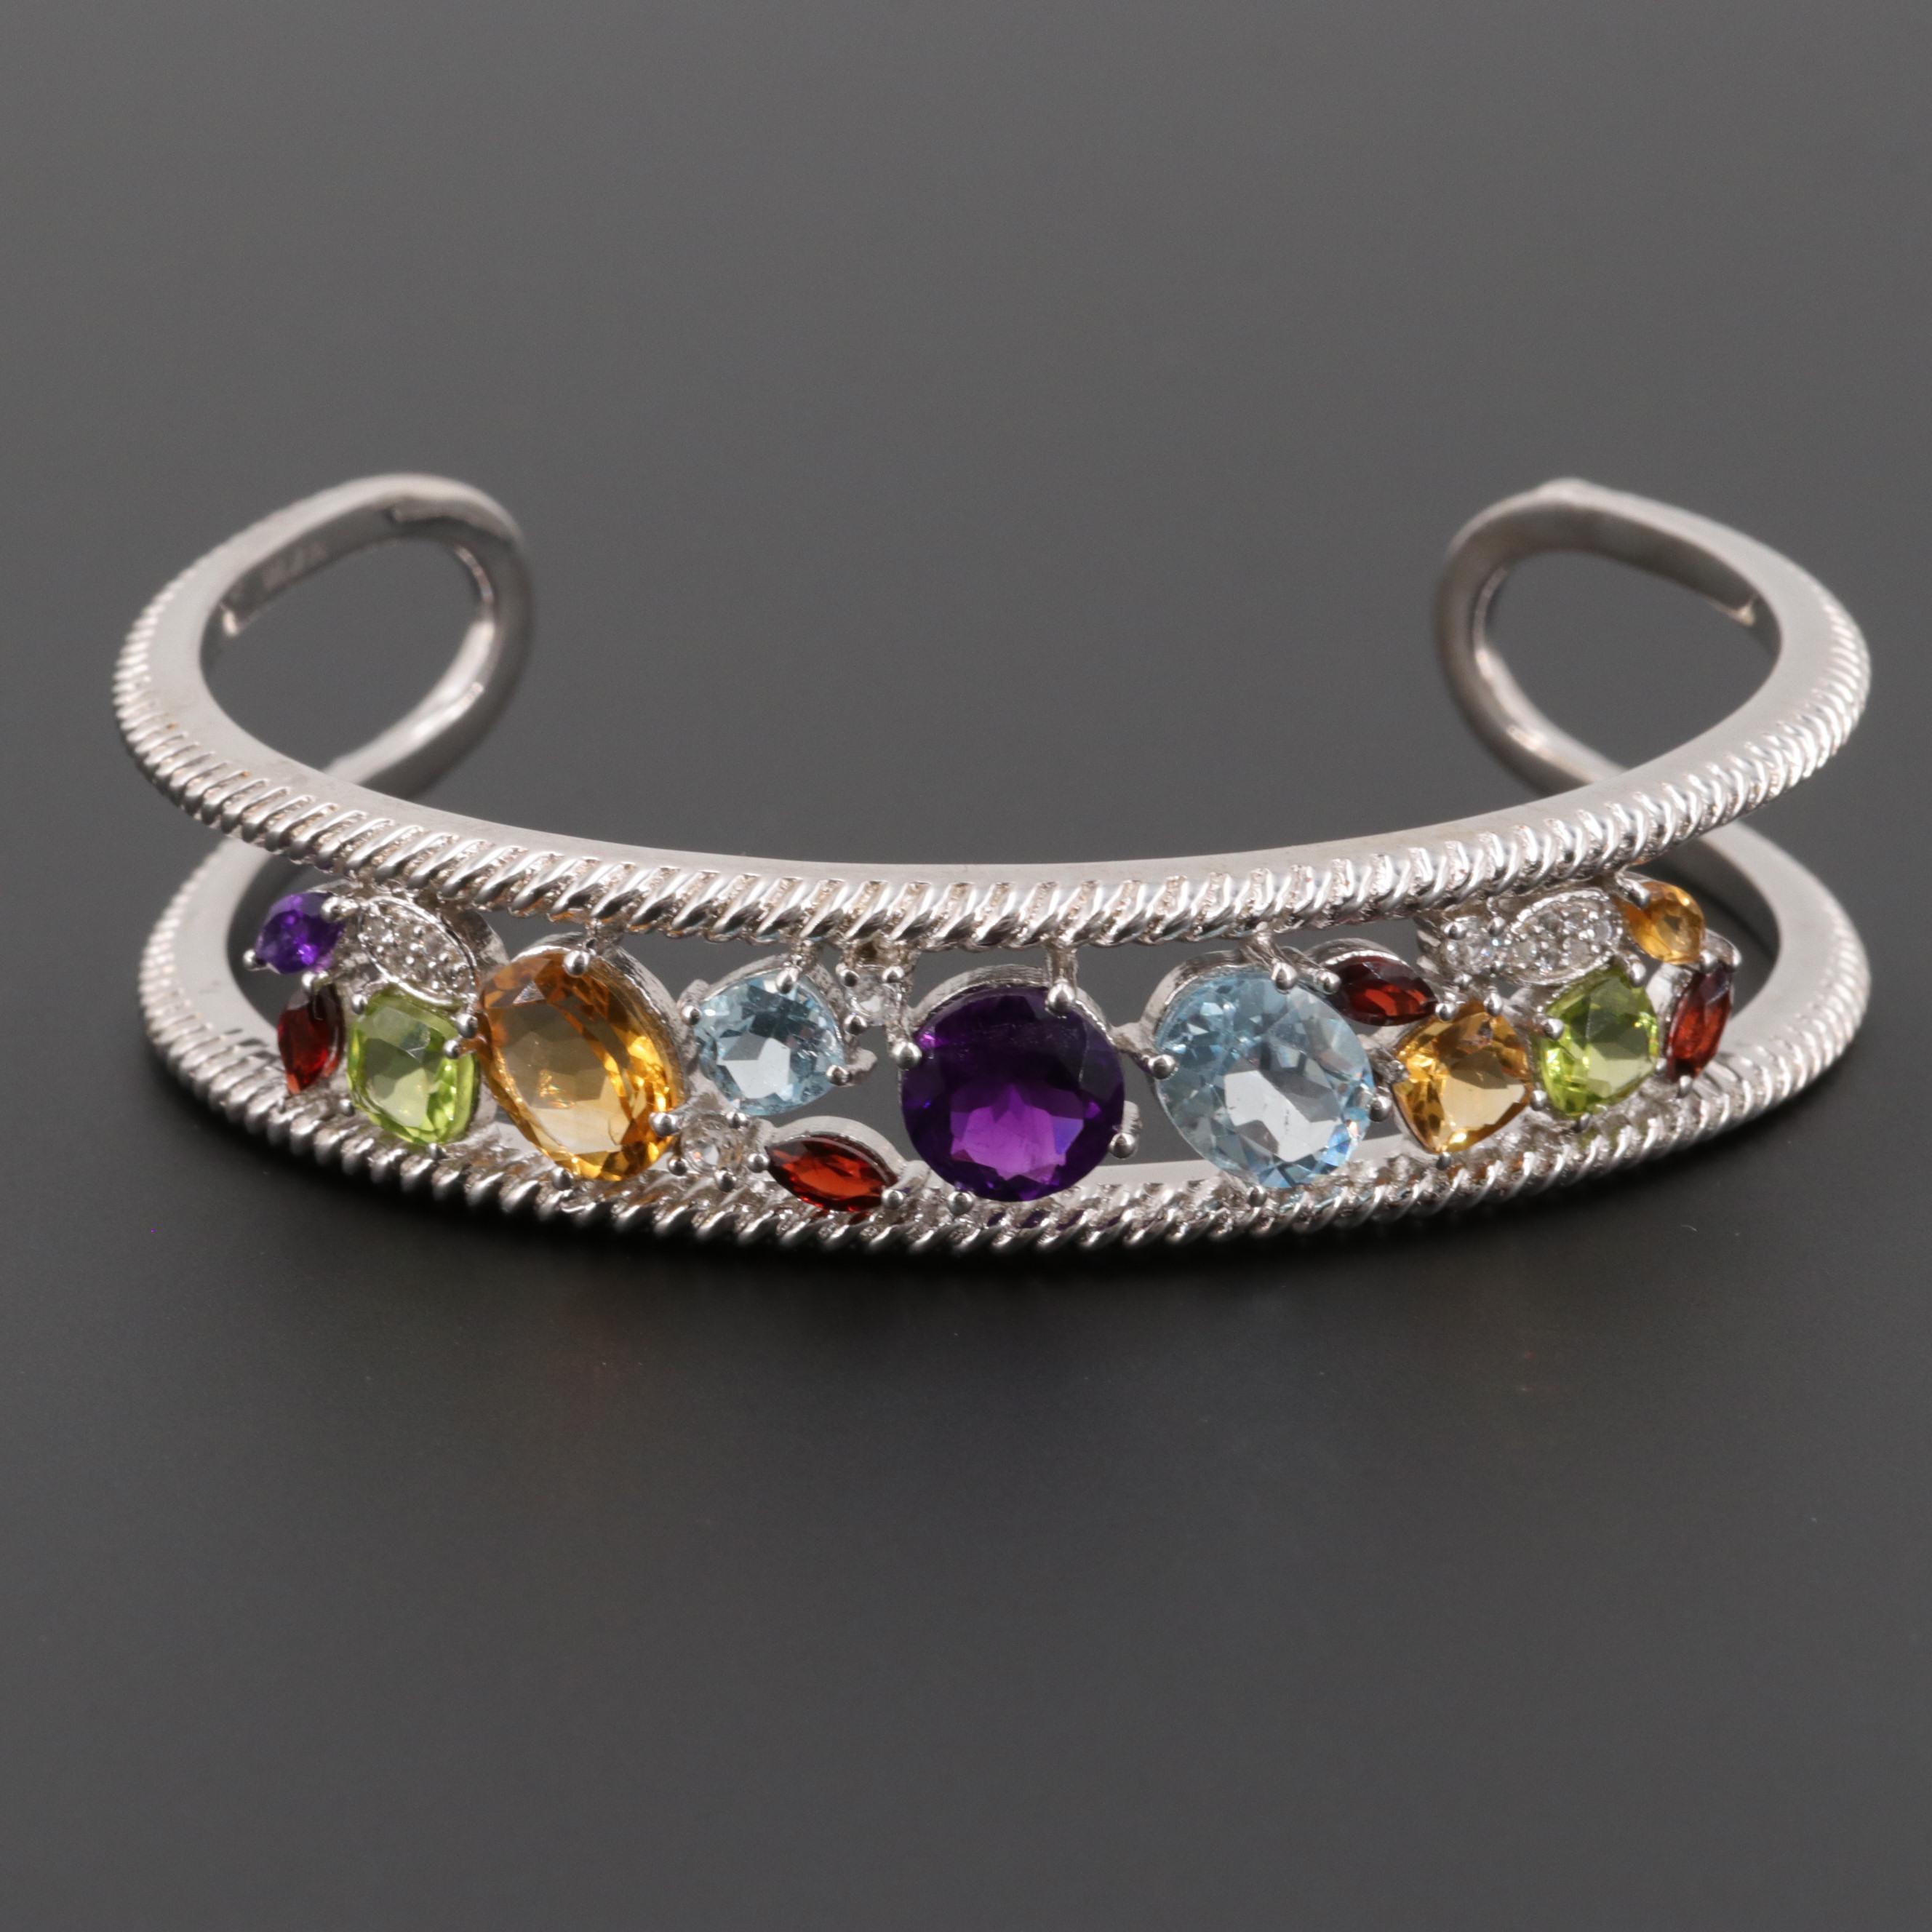 Sterling Silver Amethyst, Blue Topaz and Gemstone Cuff Bracelet